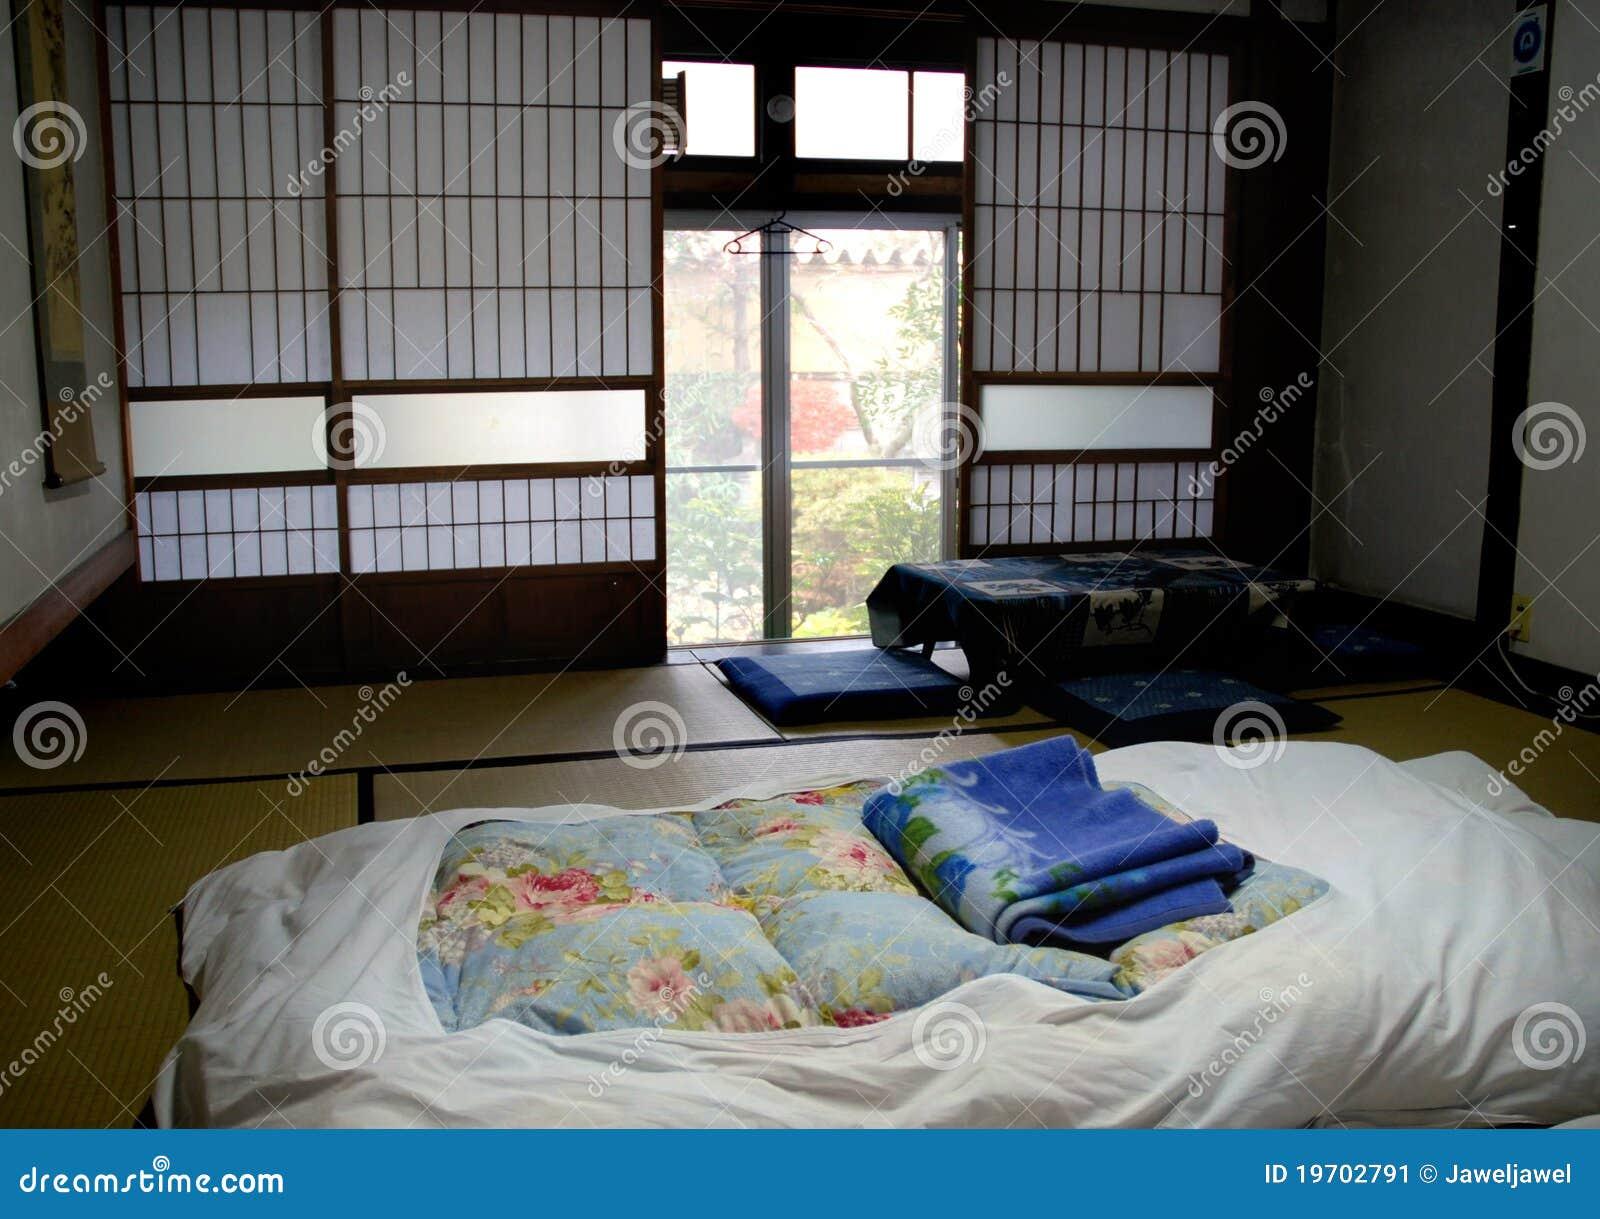 japanisches schlafzimmer stockbild bild 19702791 On japanisches schlafzimmer